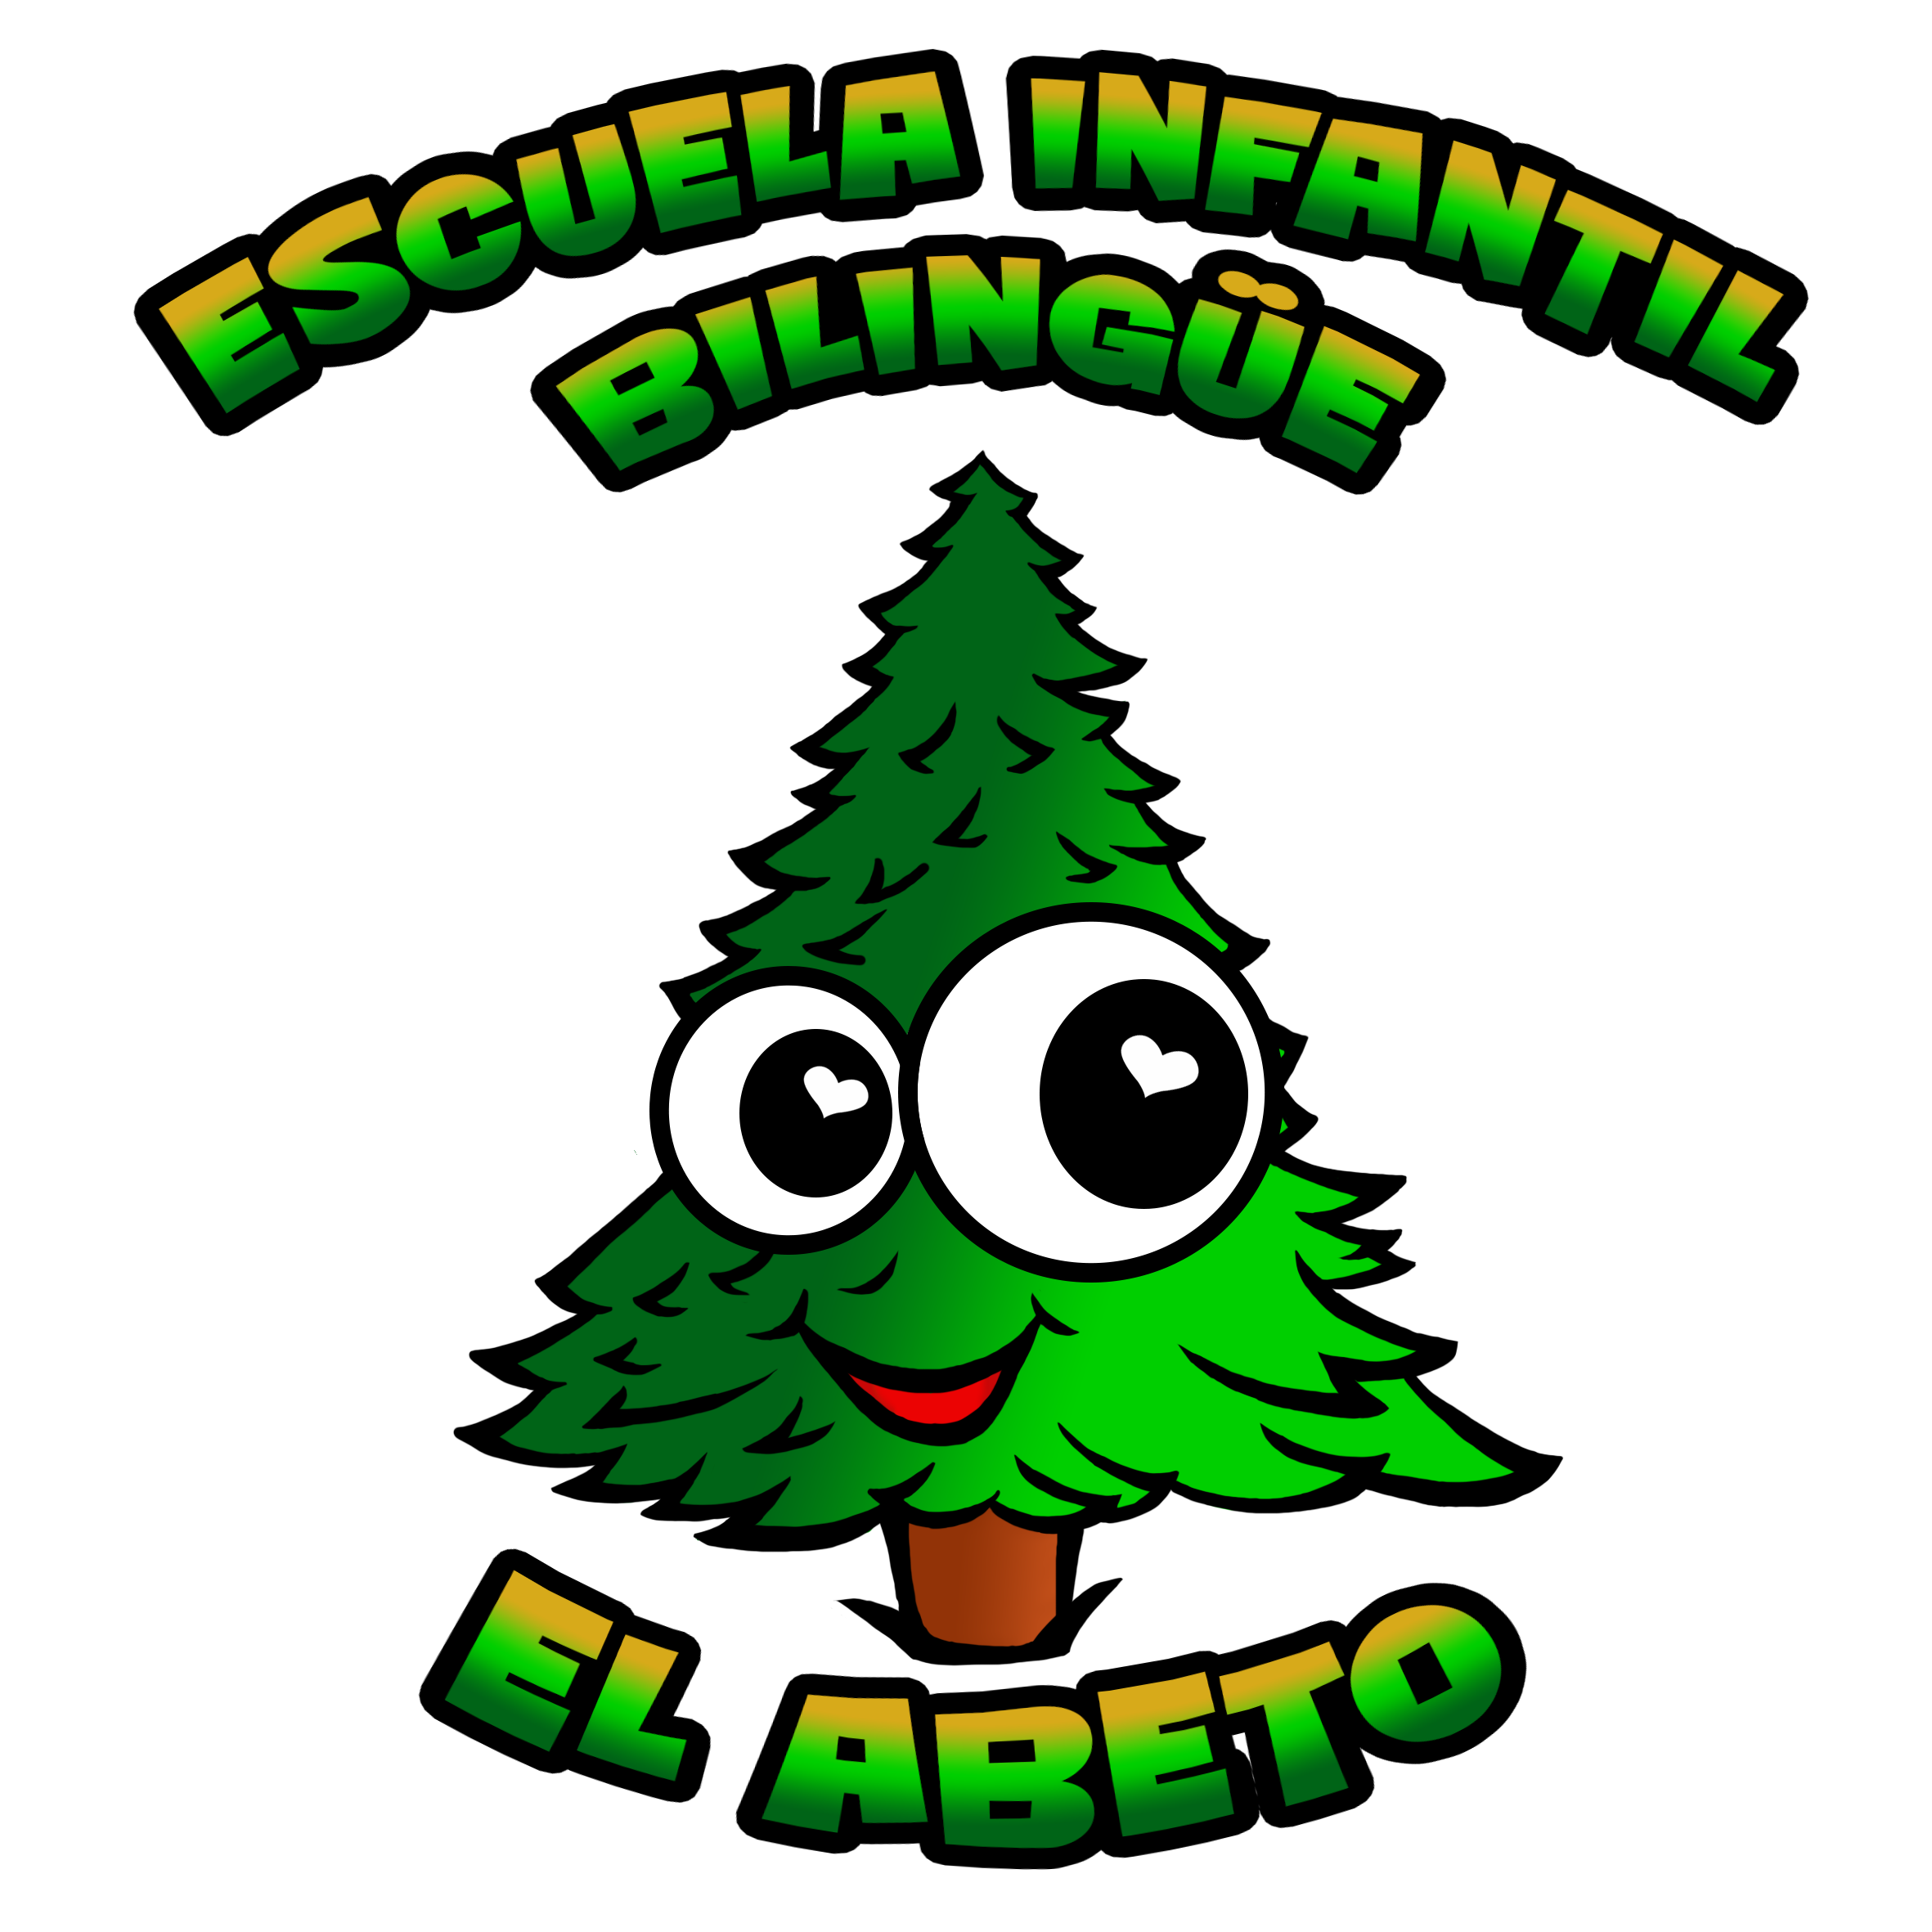 El Abeto Escuela Infantil Bilingüe